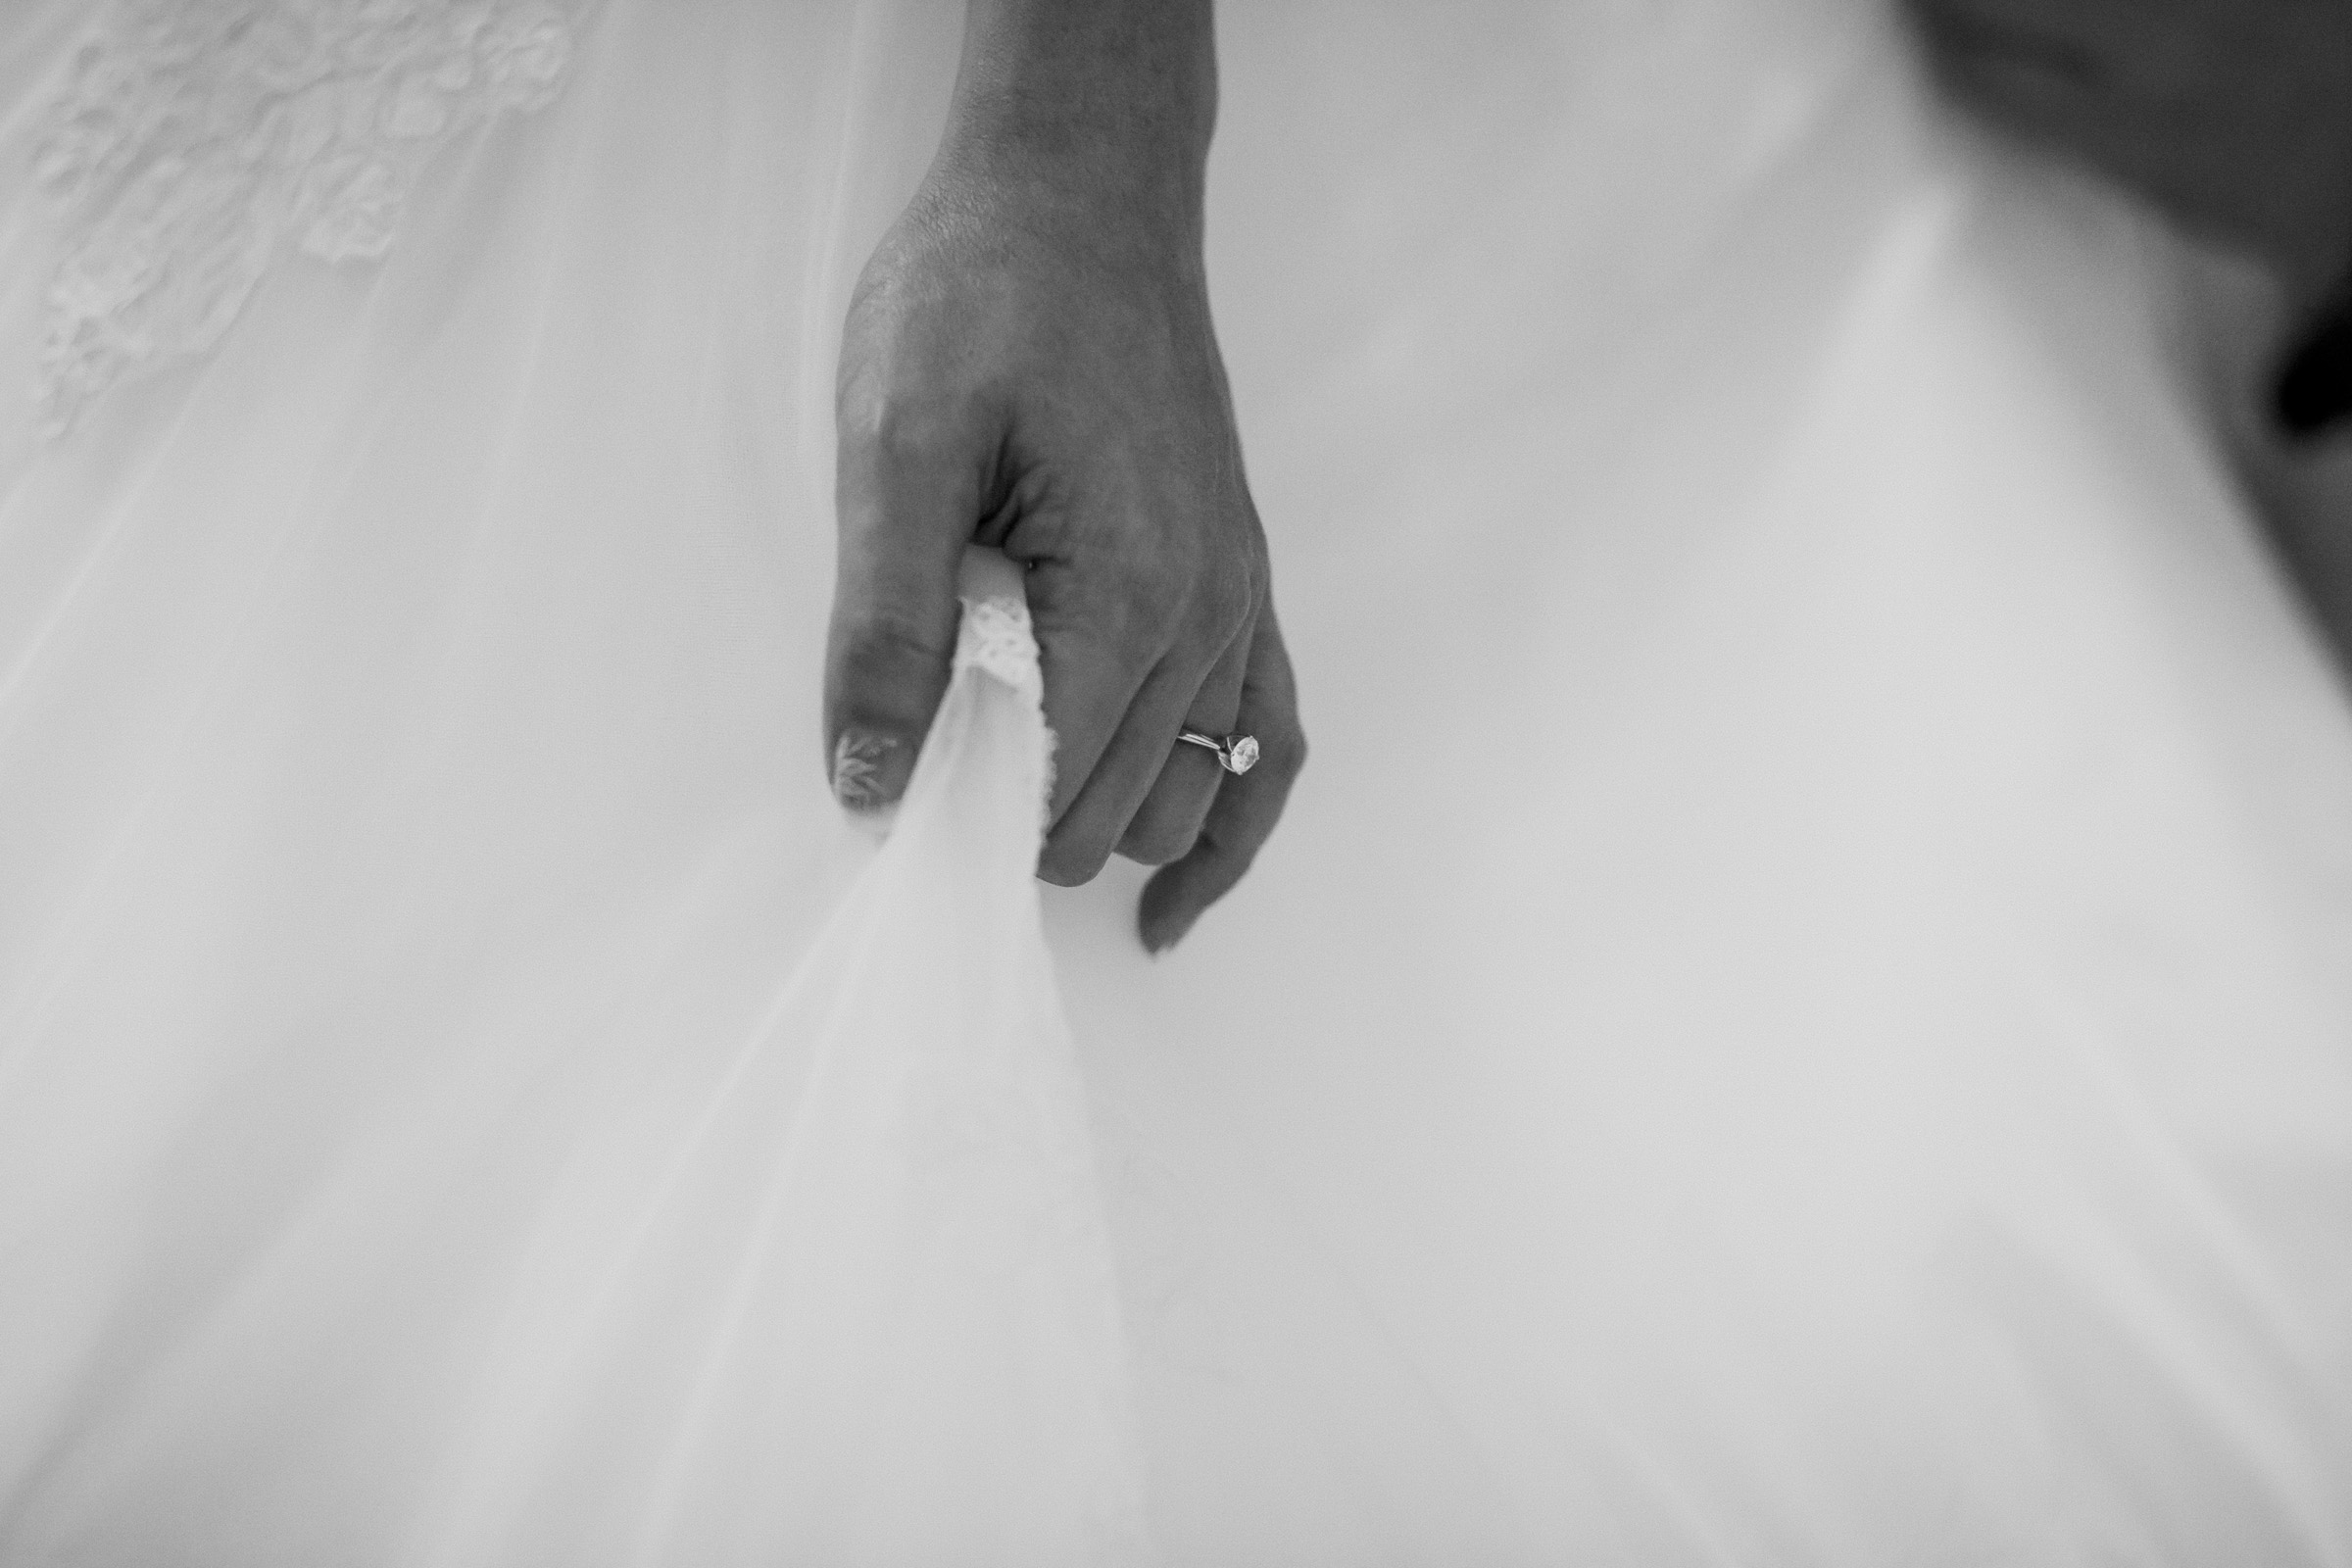 Steven_Jasmine_Wedding_Walldrobe Photography_Wedding shoots_Actual day wedding_Photographer (8)